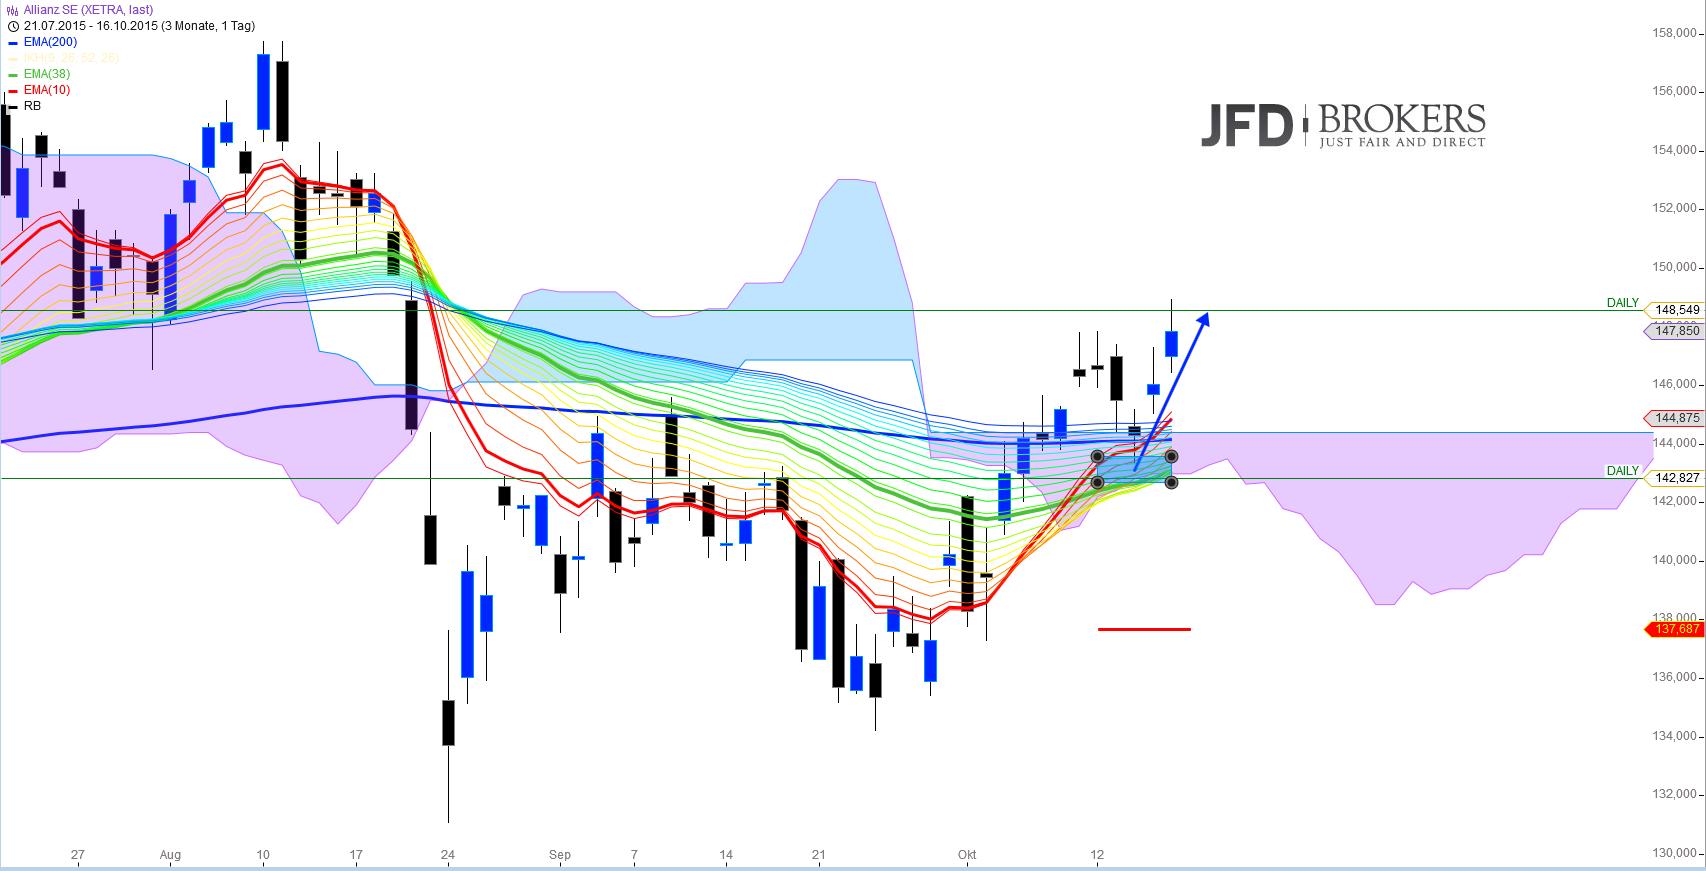 DAX-Big-Picture-Analyse-Kommentar-JFD-Brokers-GodmodeTrader.de-5